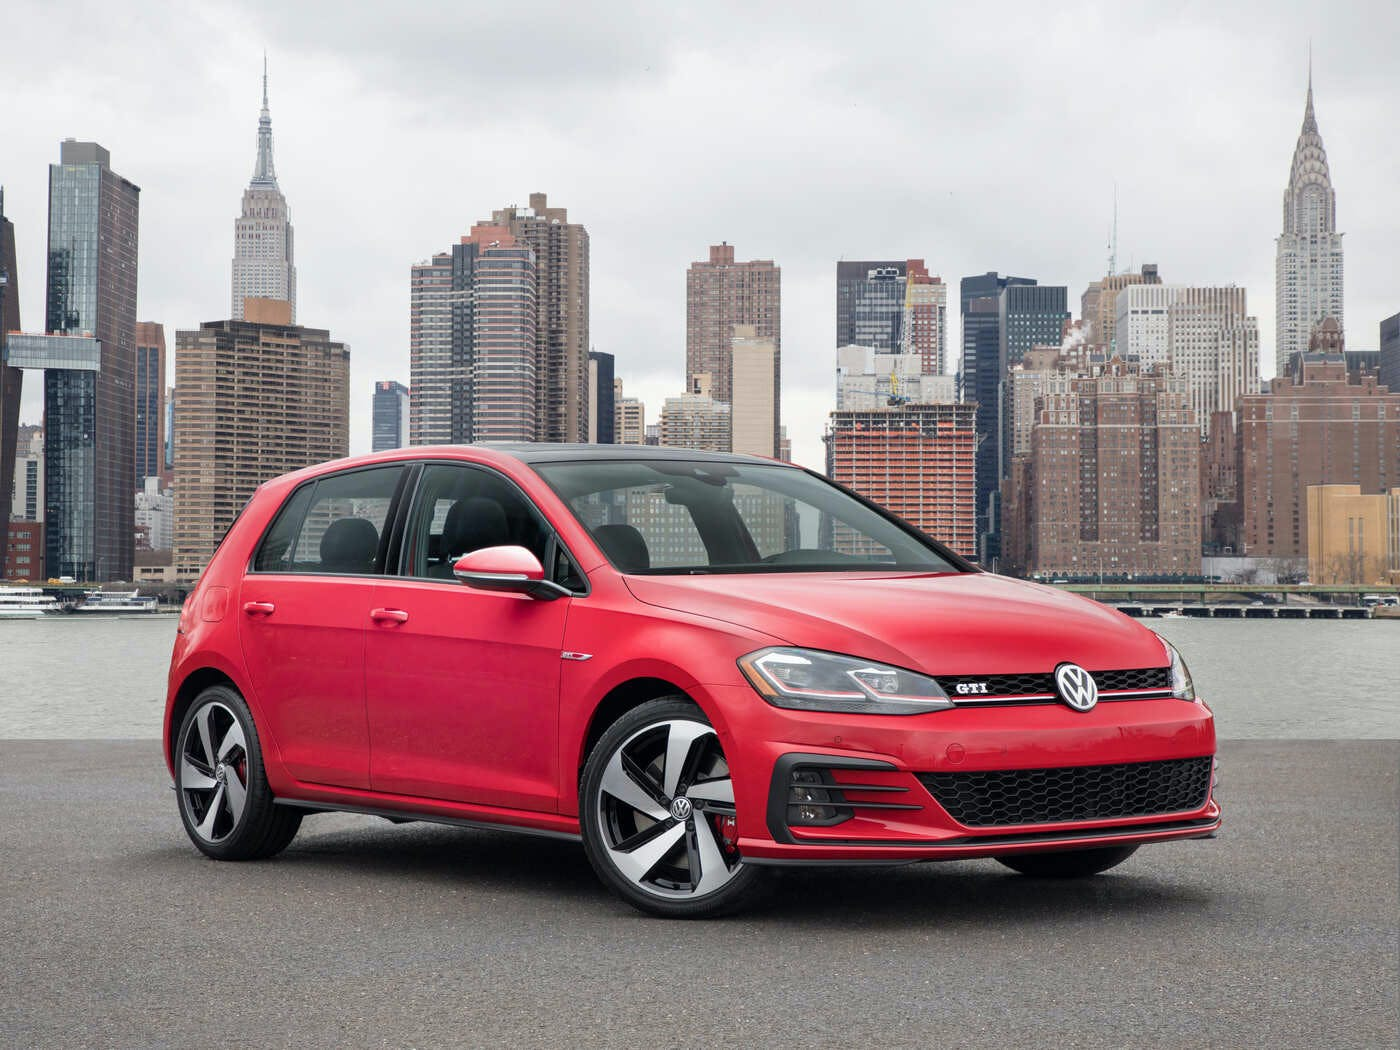 2019 Volkswagen Golf GTI Comparisons, Reviews & Pictures